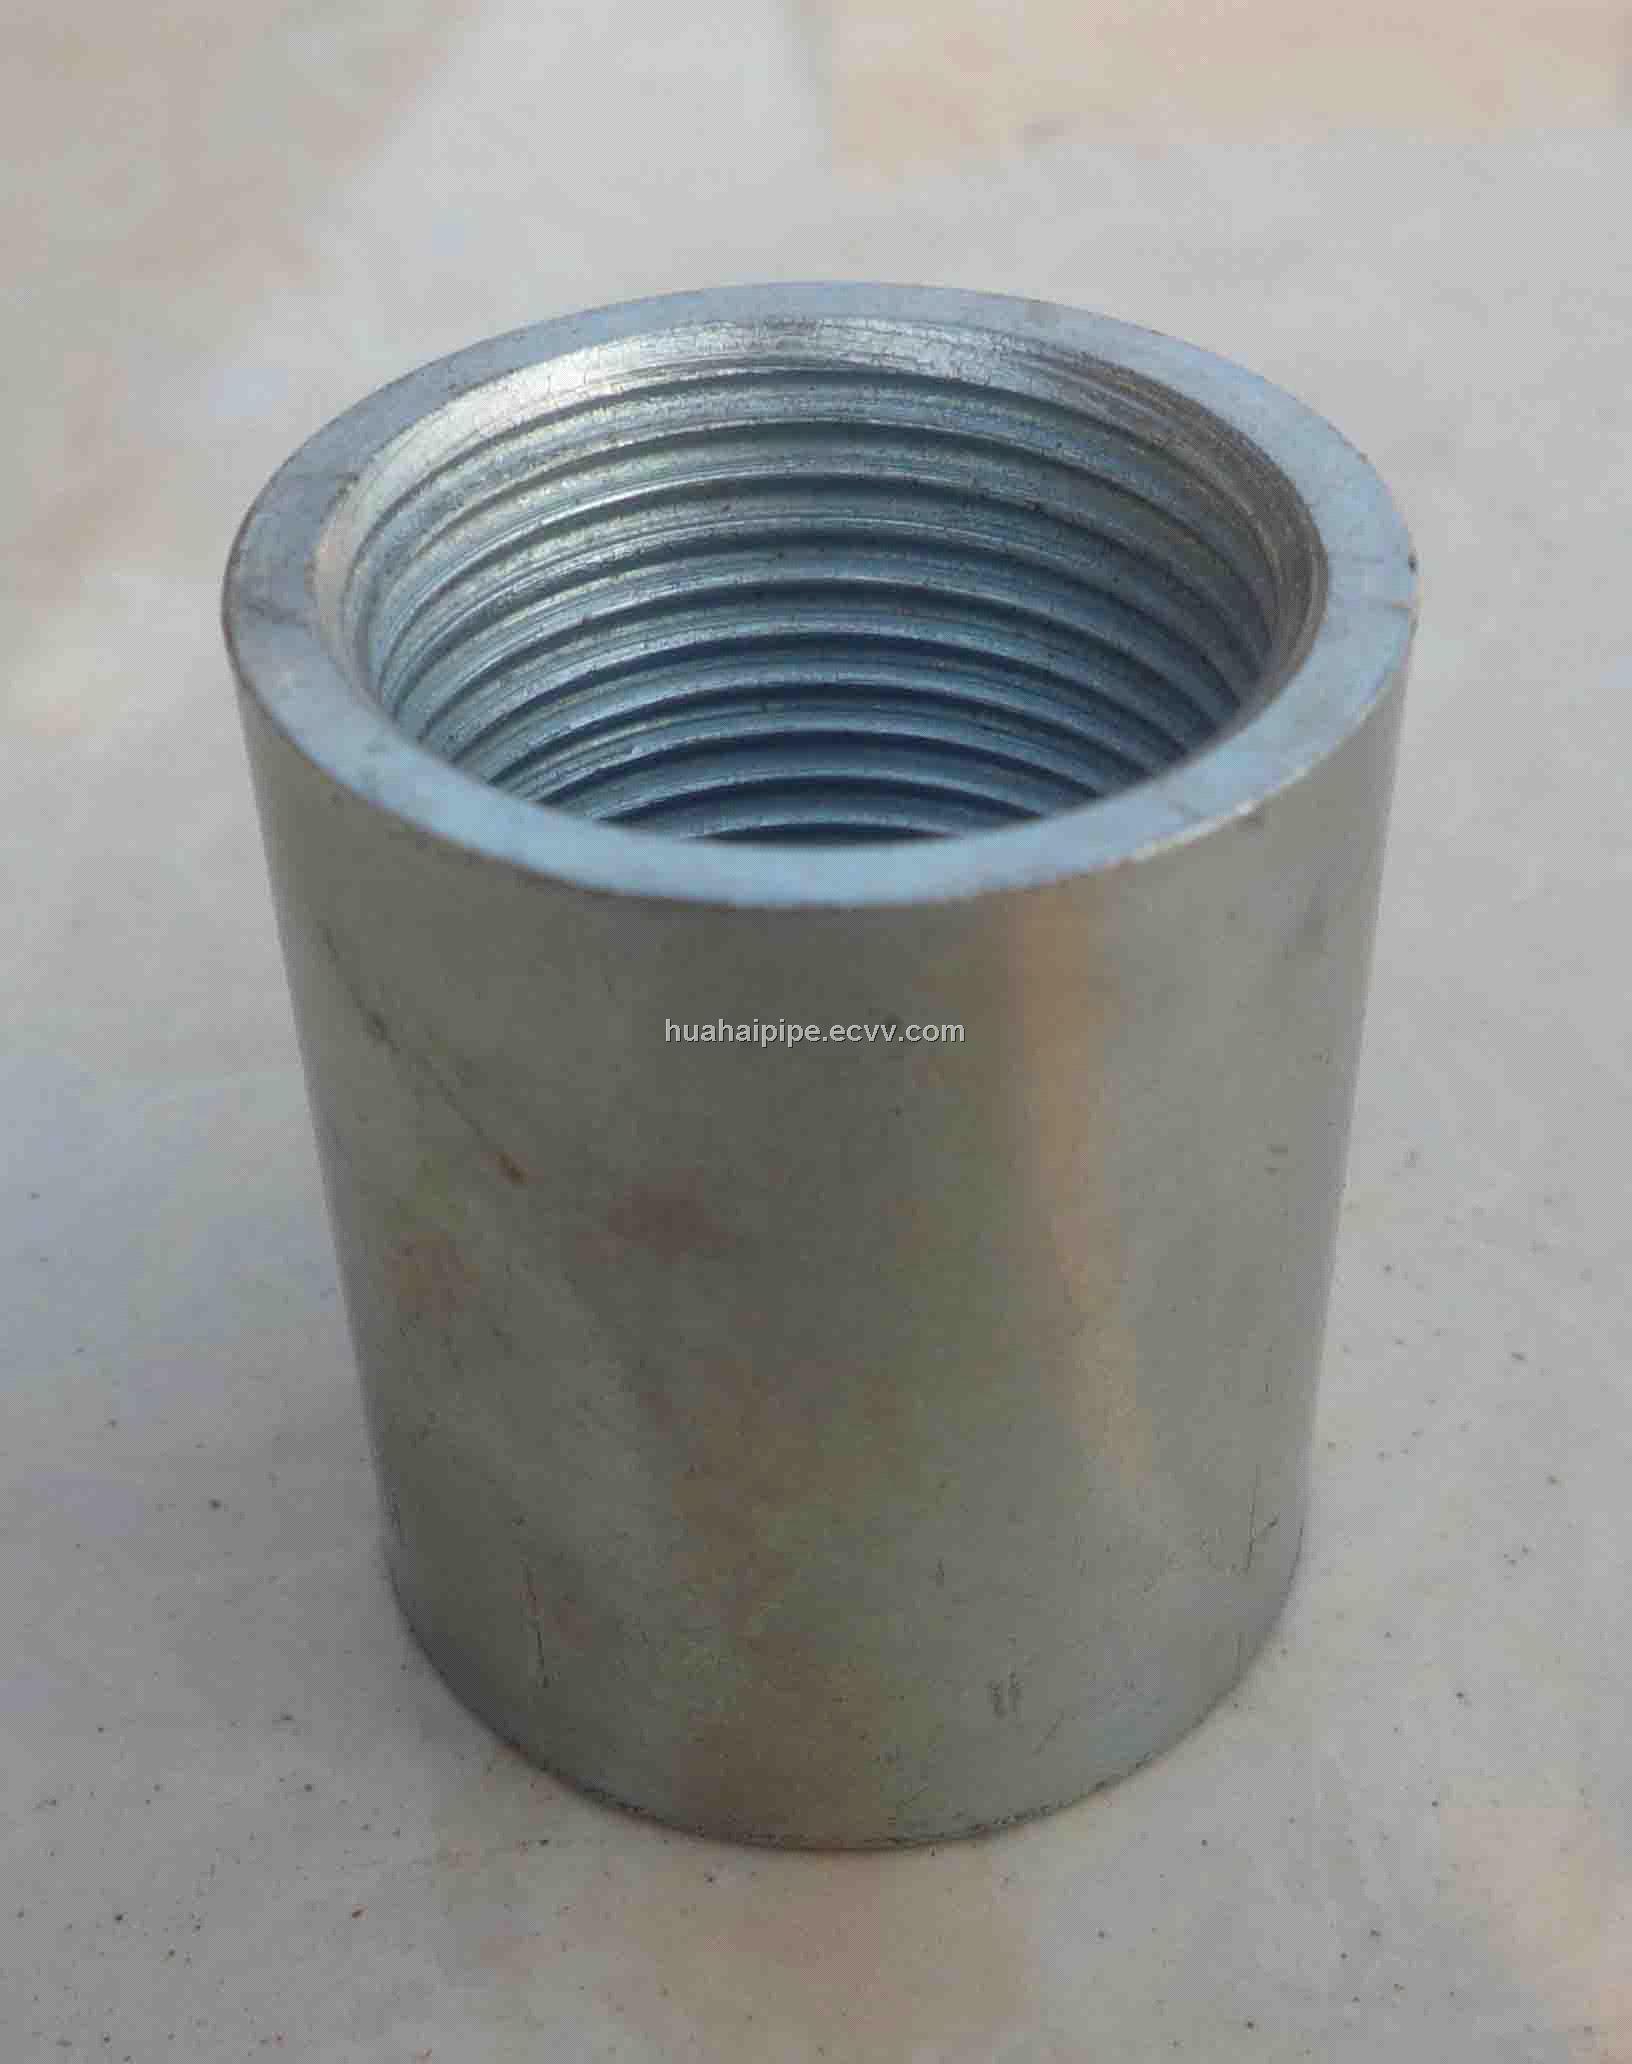 Hot galvanized carbon steel socket coupling din bspt